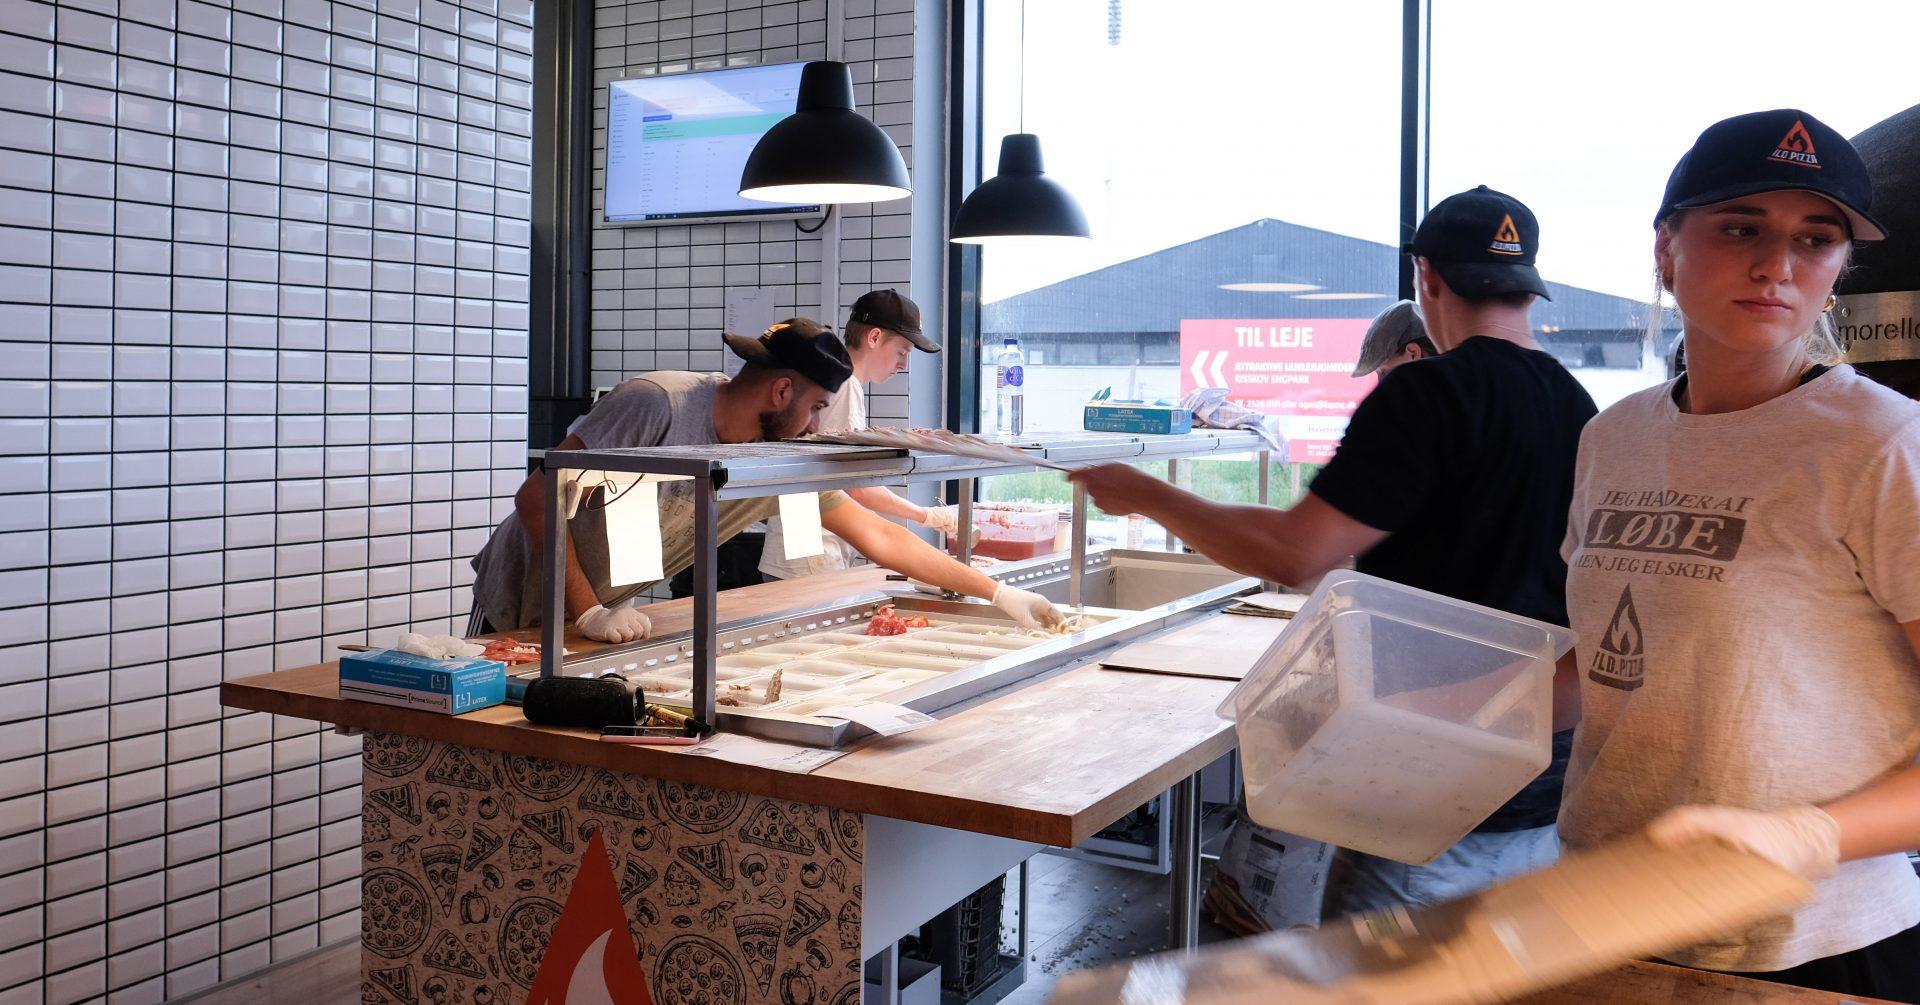 Goodbye Italien: Ild.pizza scorer topkarakter i deres brændefyret stenovn